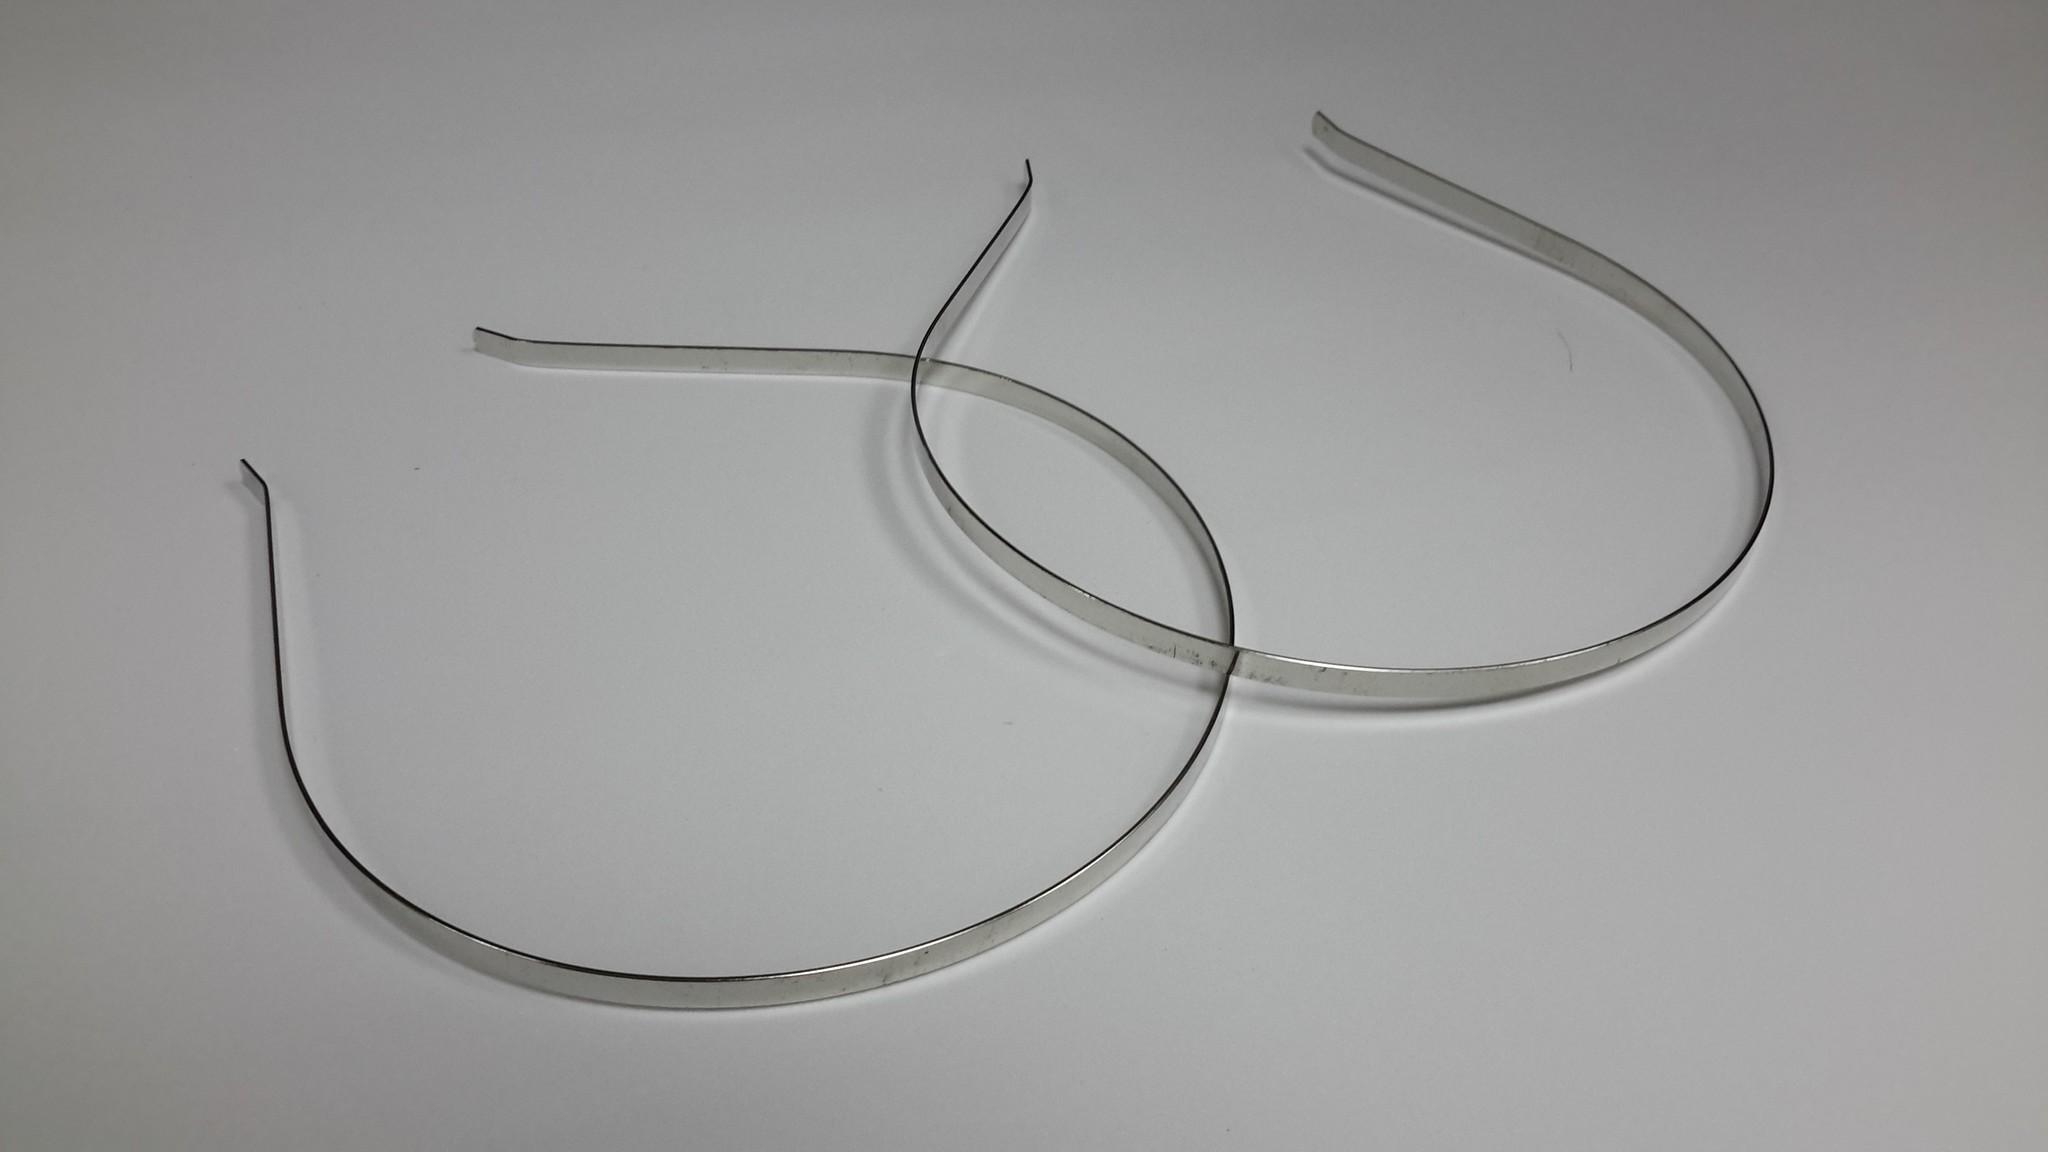 Основа - ободок 0,5 см, металл.